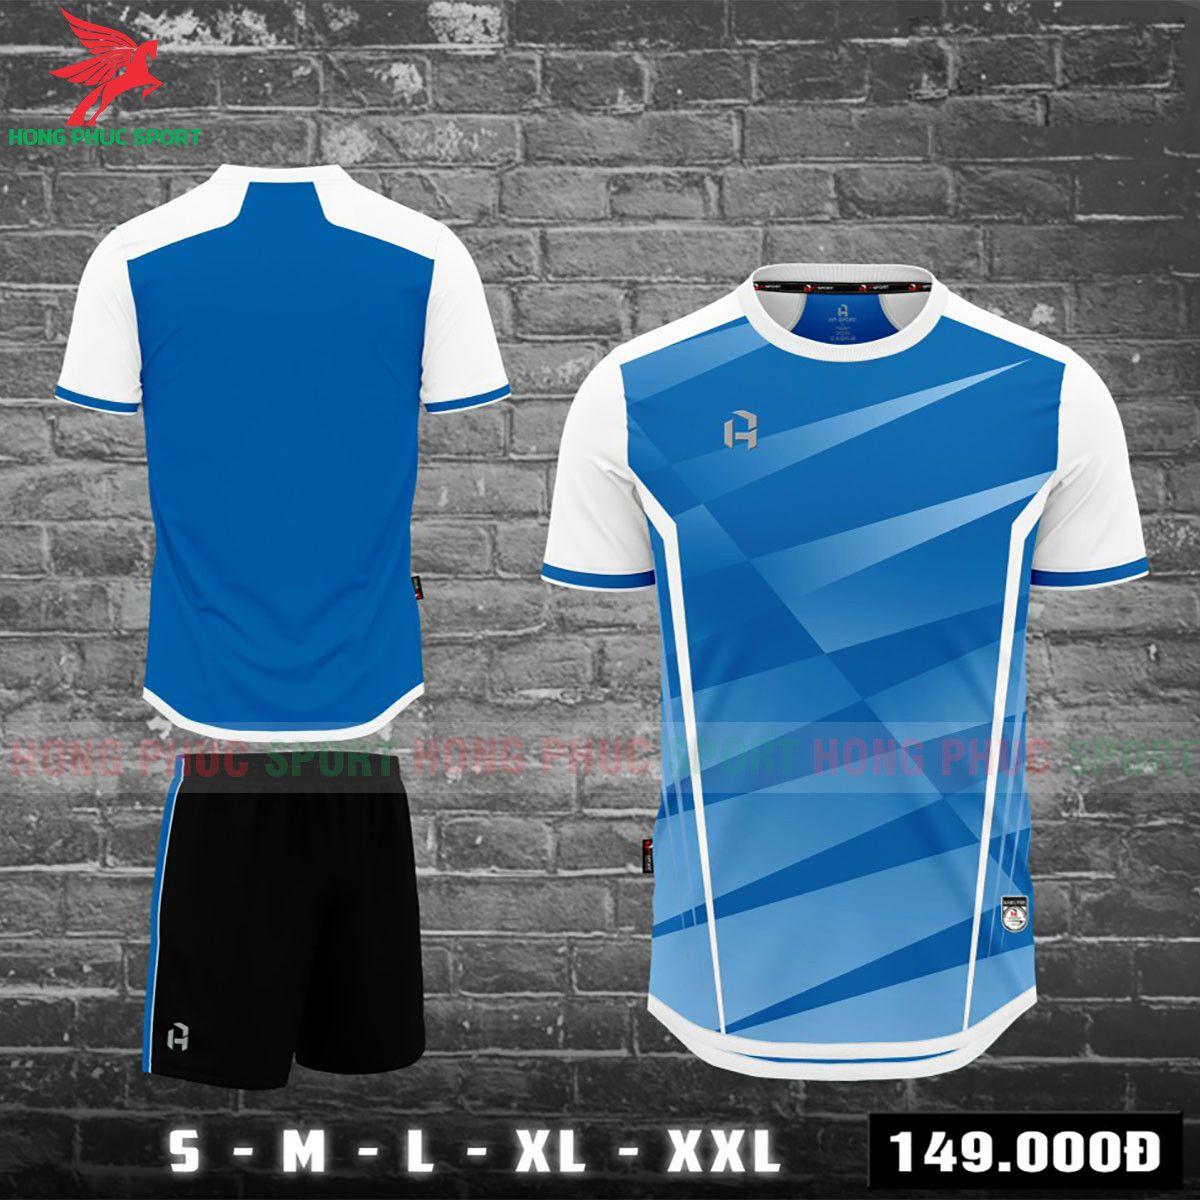 https://cdn.hongphucsport.com/unsafe/s4.shopbay.vn/files/285/ao-bong-da-khong-logo-hp-sport-2021-bebotux-xanh-duong-60f5310397187.jpg